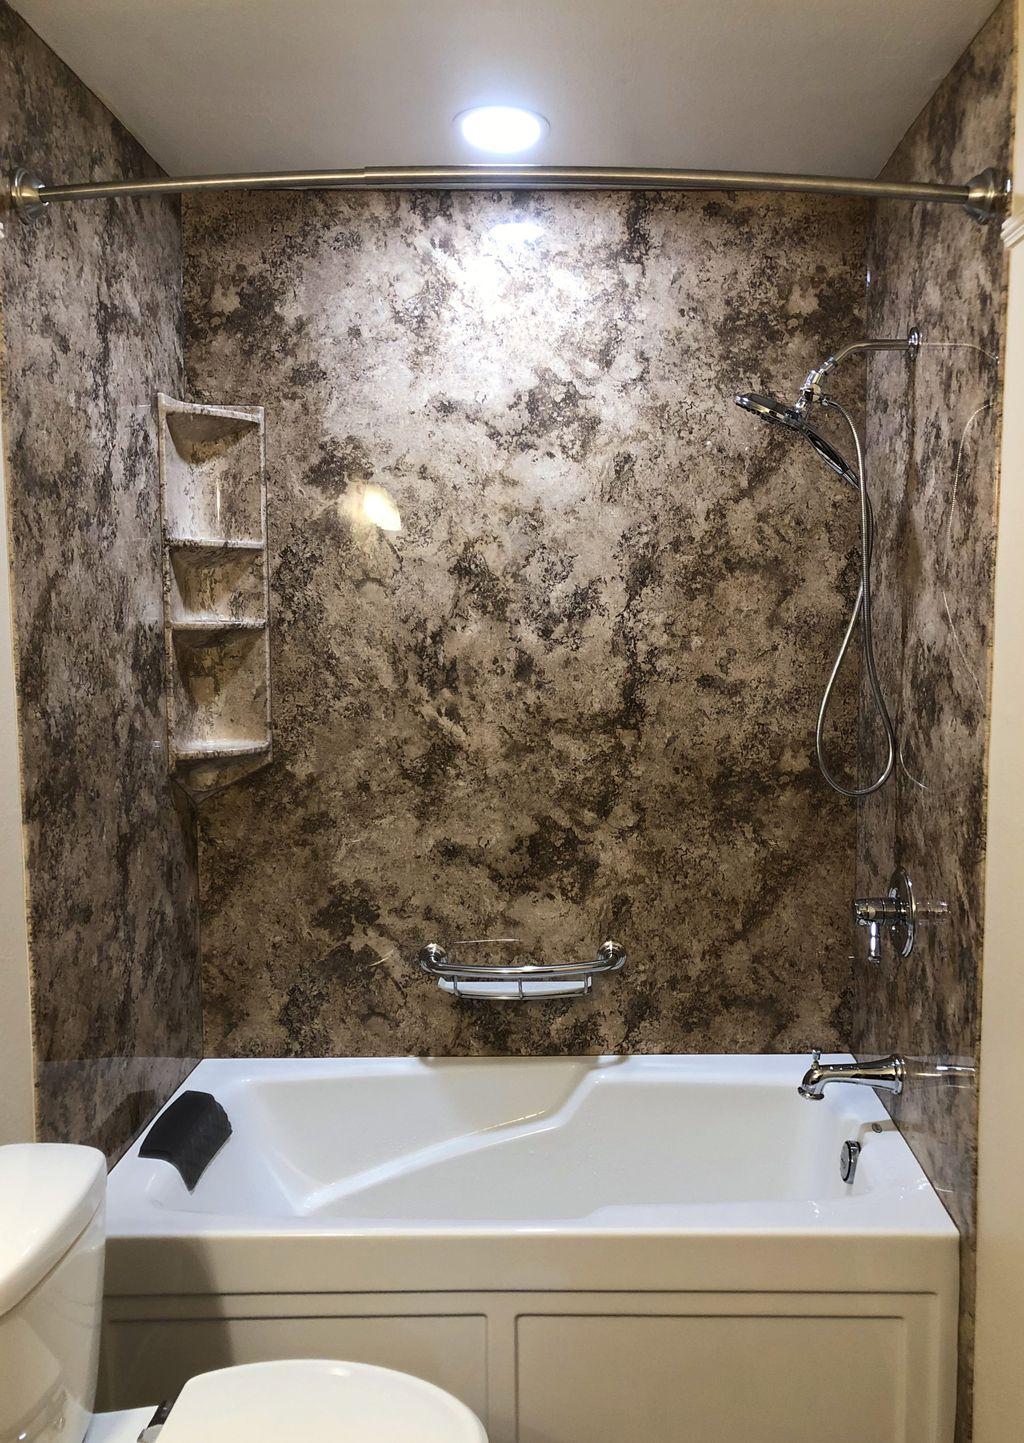 Bathroom Tub & Shower Upgrade